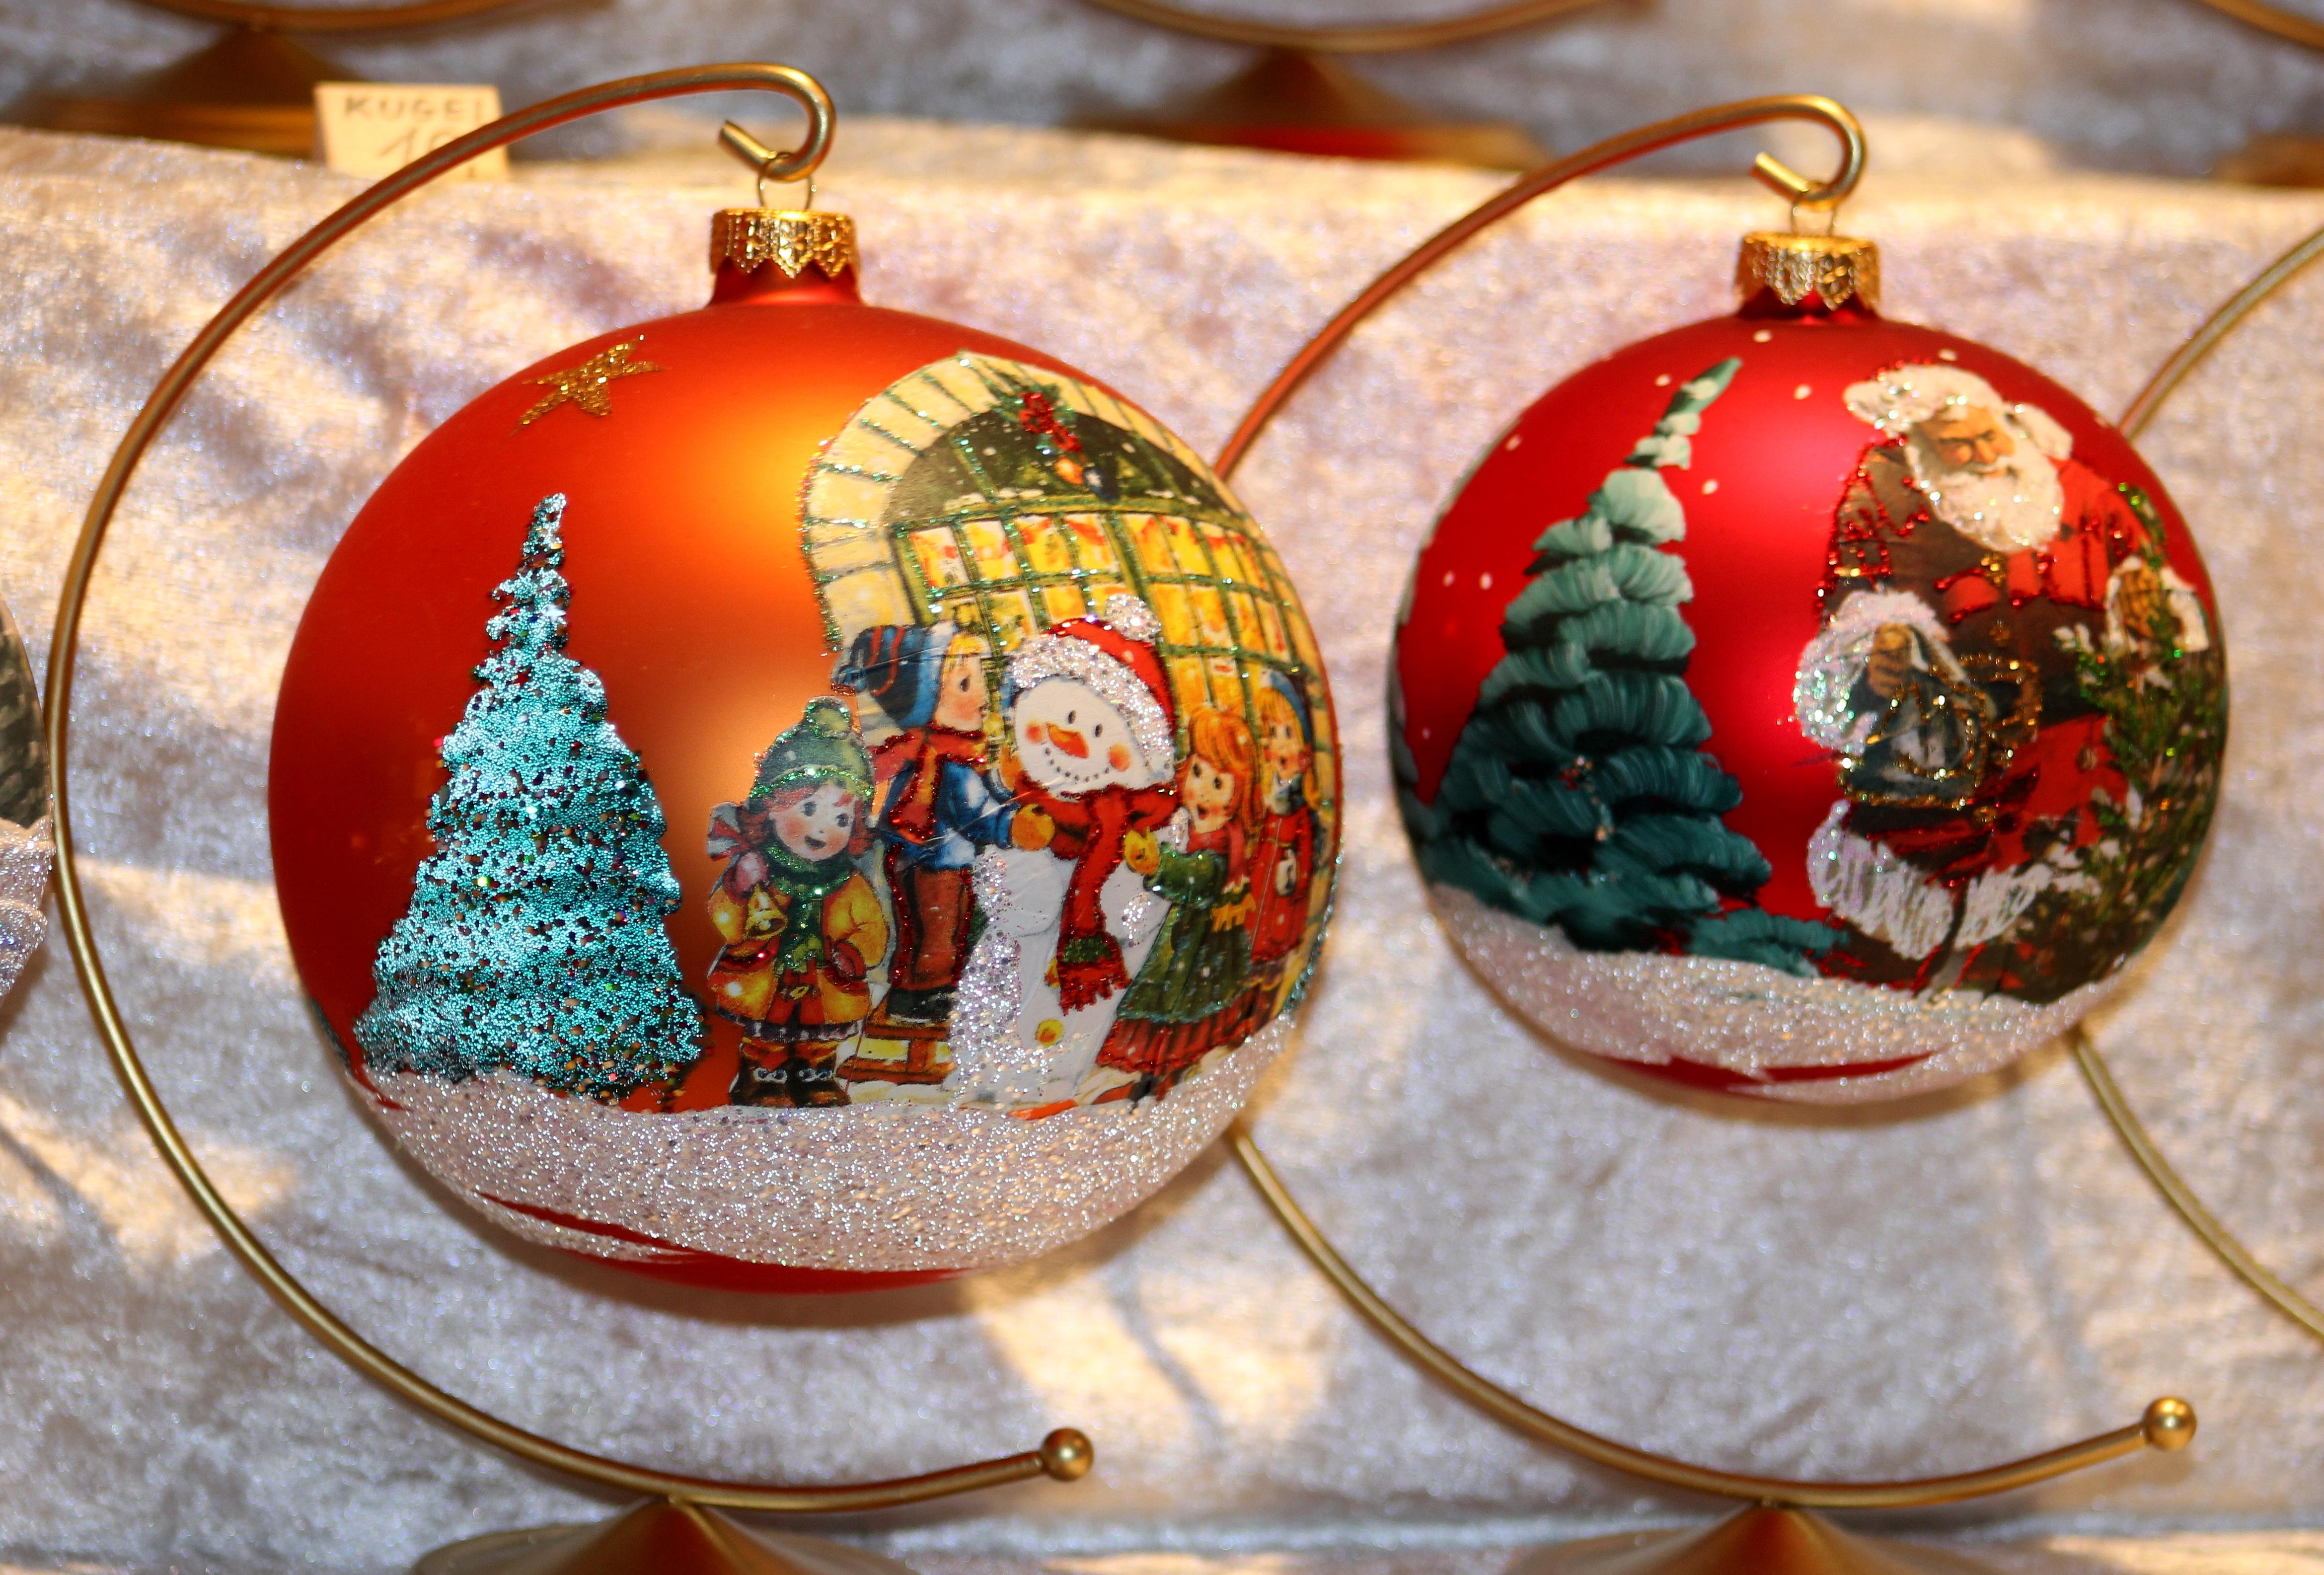 File:Dekoration. Weihnachtskugel. IMG 8345WI.jpg - Wikimedia Commons